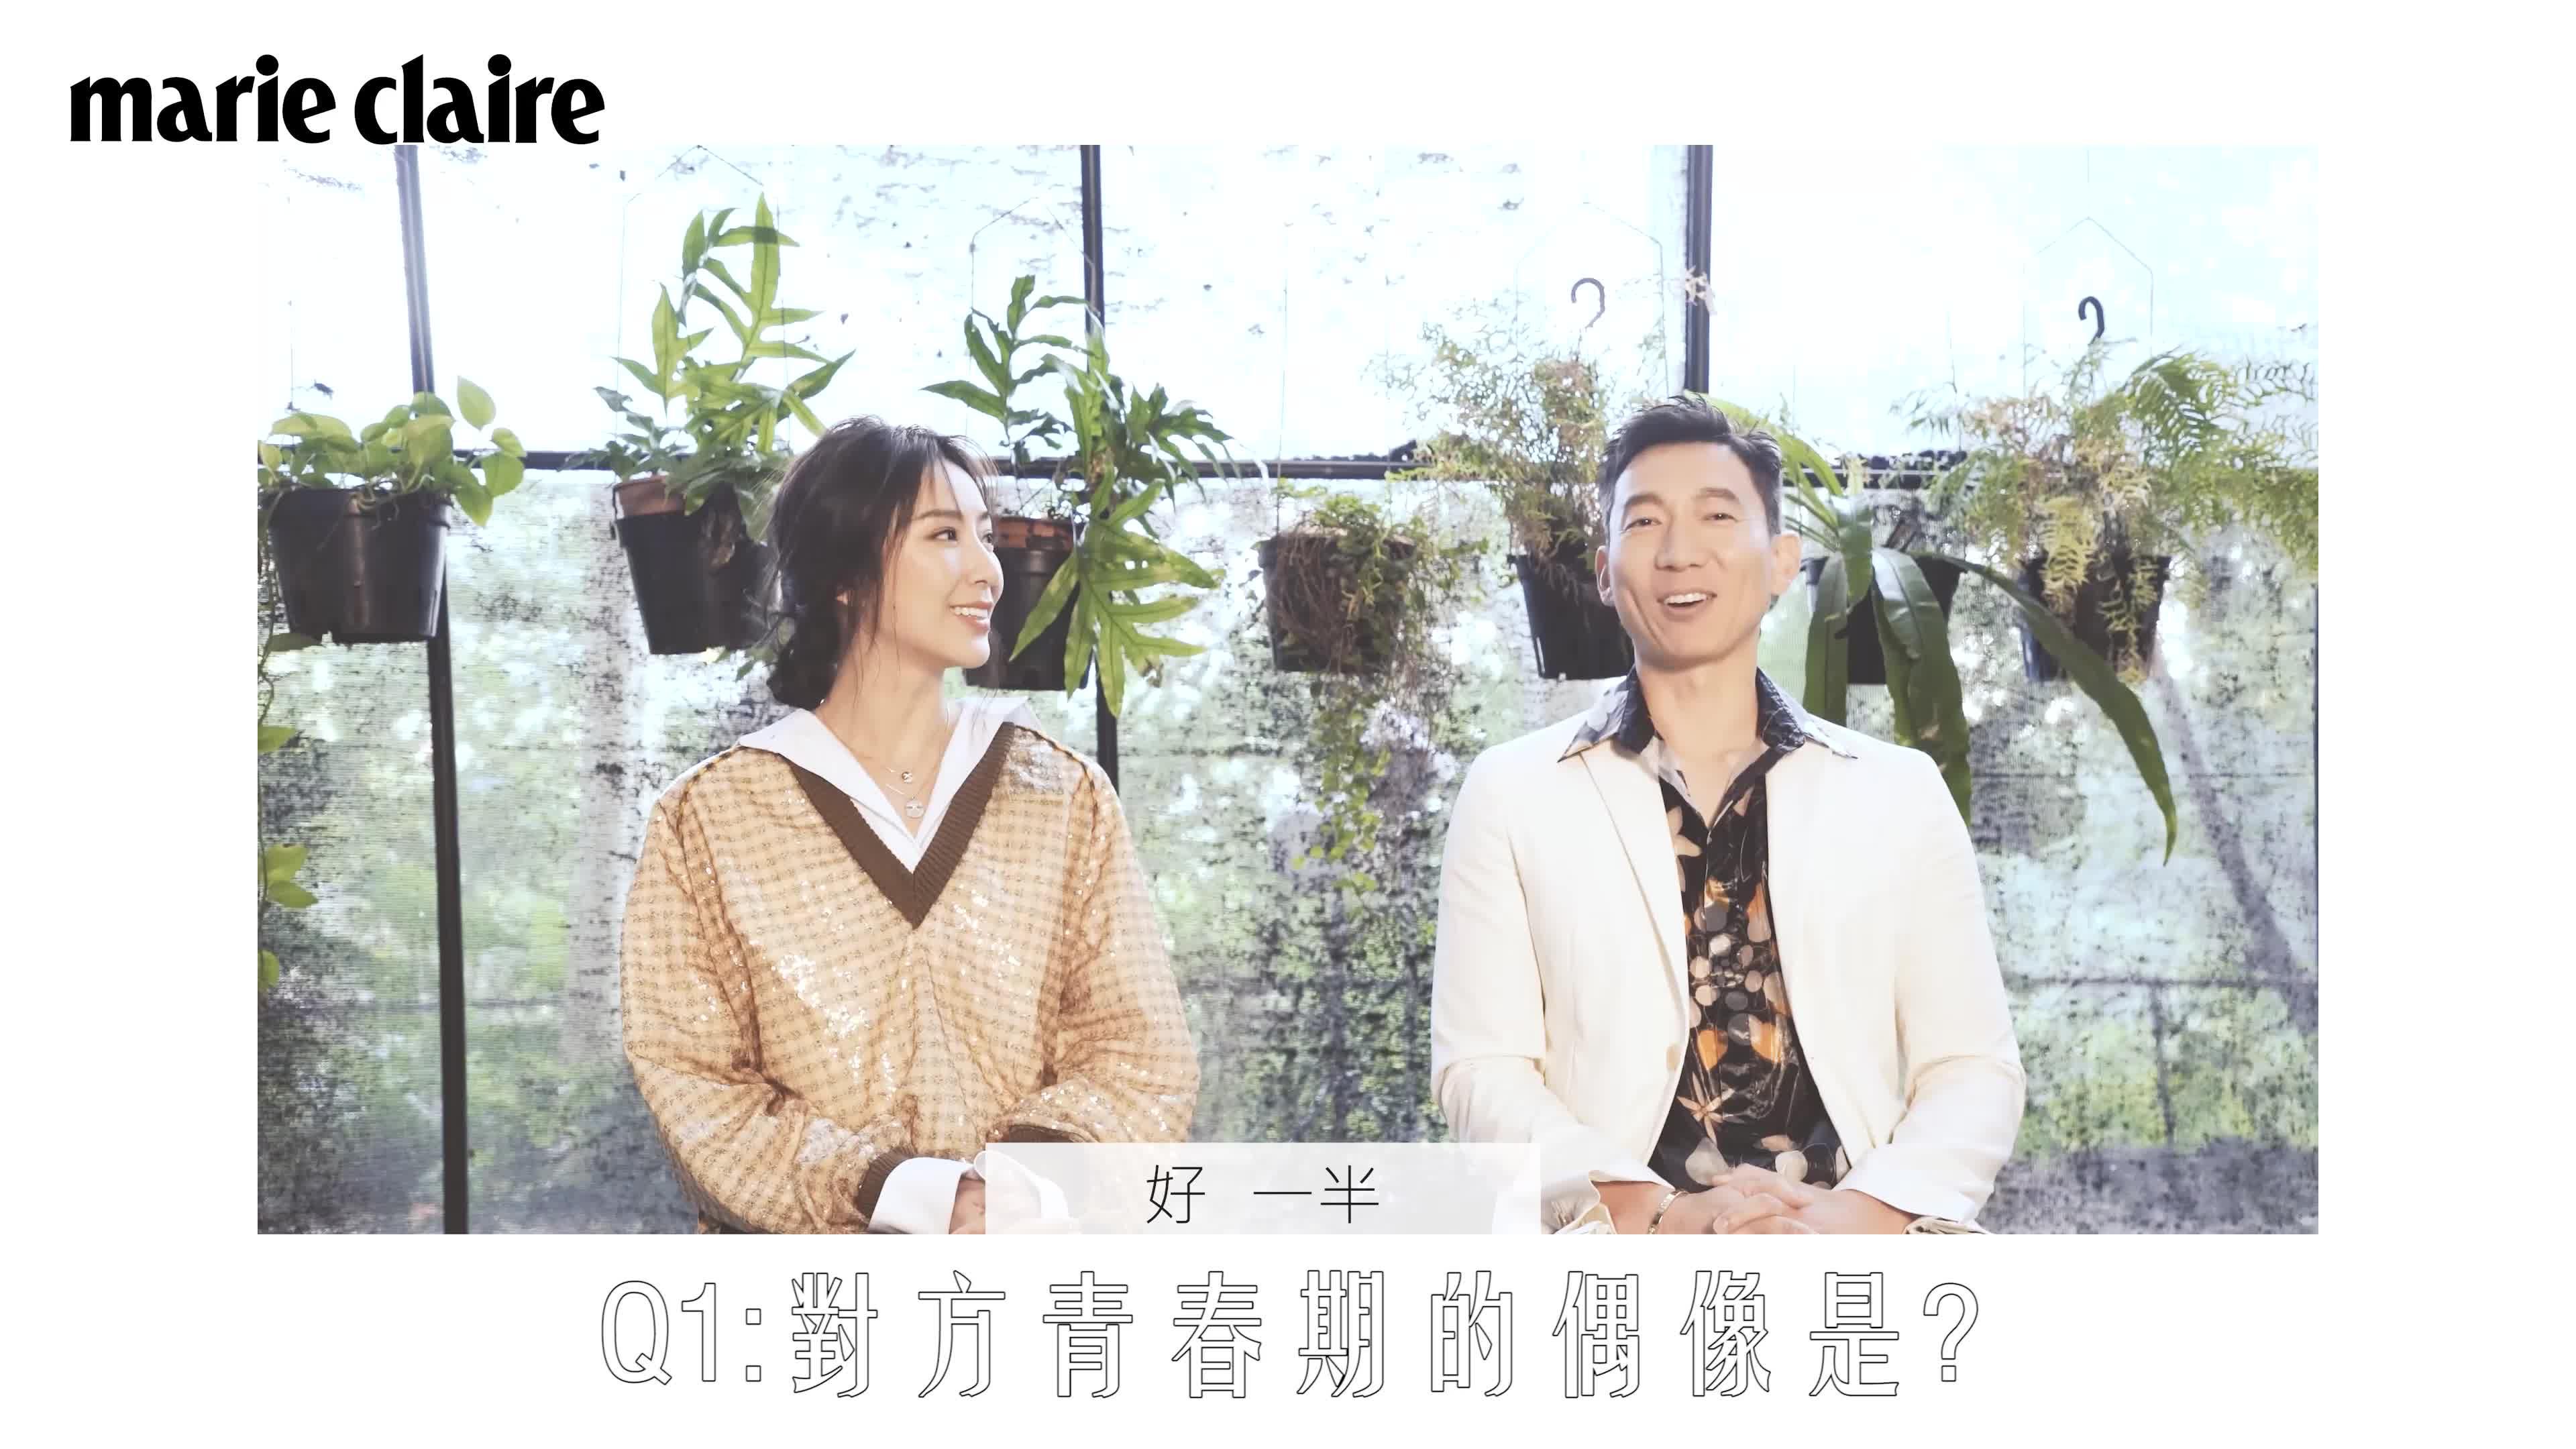 Marie Claire 2020.2月號 隋棠&Tony 最甜蜜銀色夫妻檔的默契大挑戰